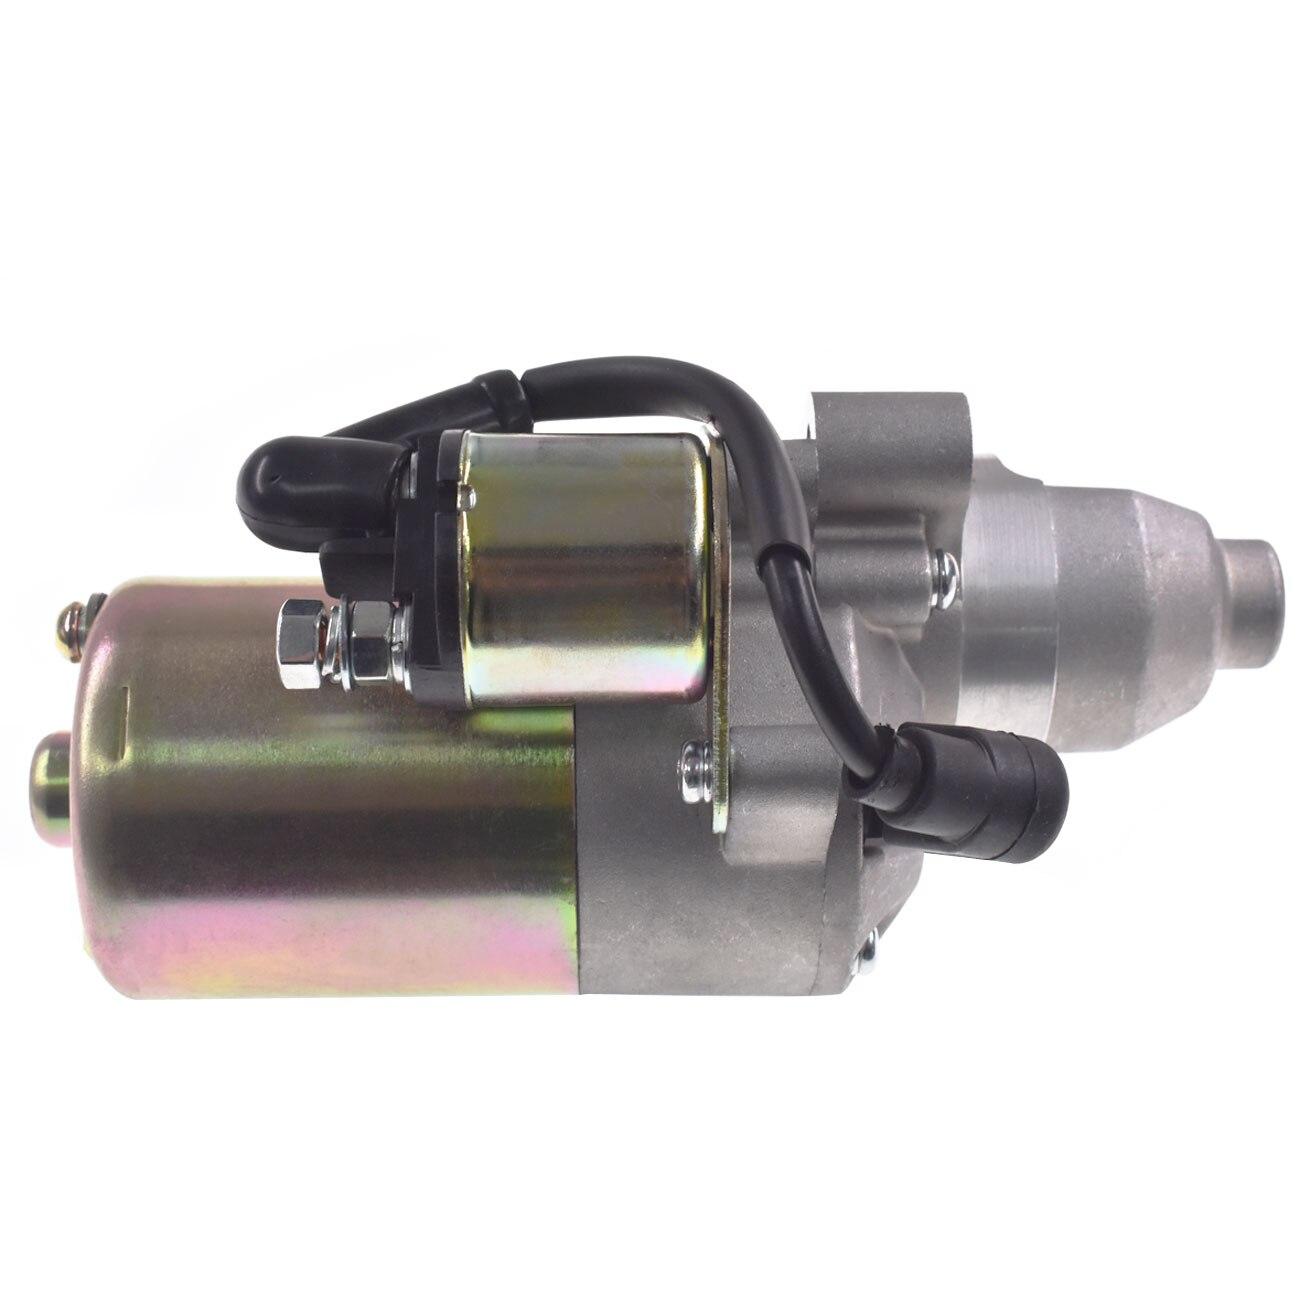 home improvement : HUNDURE 41 1mm chainsaw cylinder and Gasket  piston assy Spark Plug Grooved Ball Bearing Kit For Partner 350 Partner 351